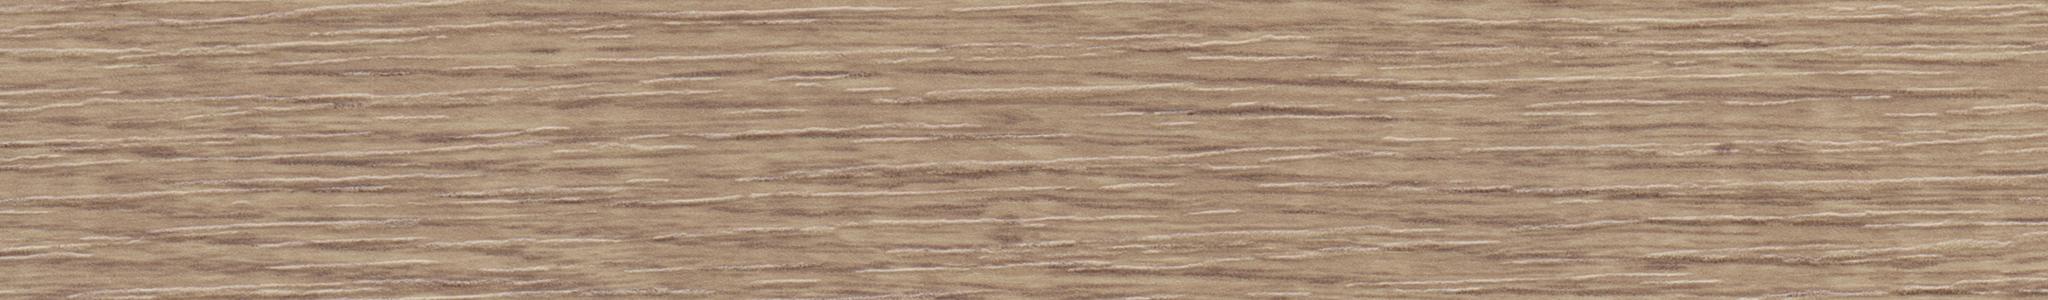 HD 245990 ABS Edge Naredo Oak Pore